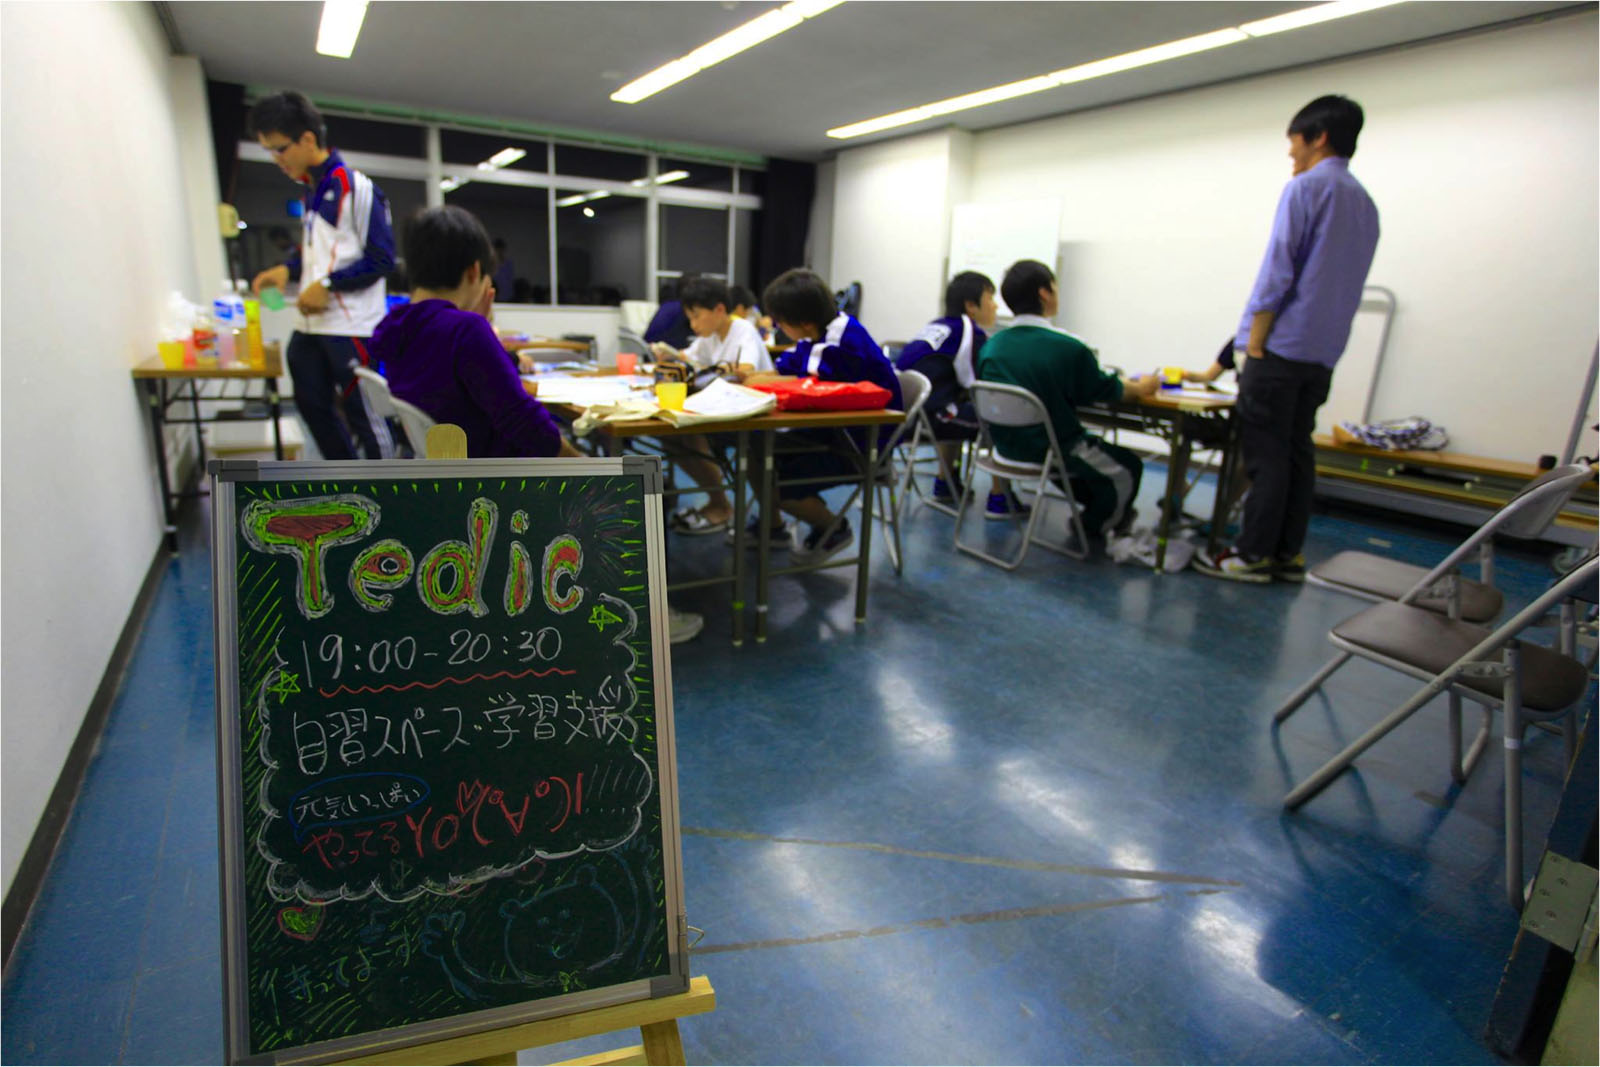 TEDICが運営する放課後教室の様子